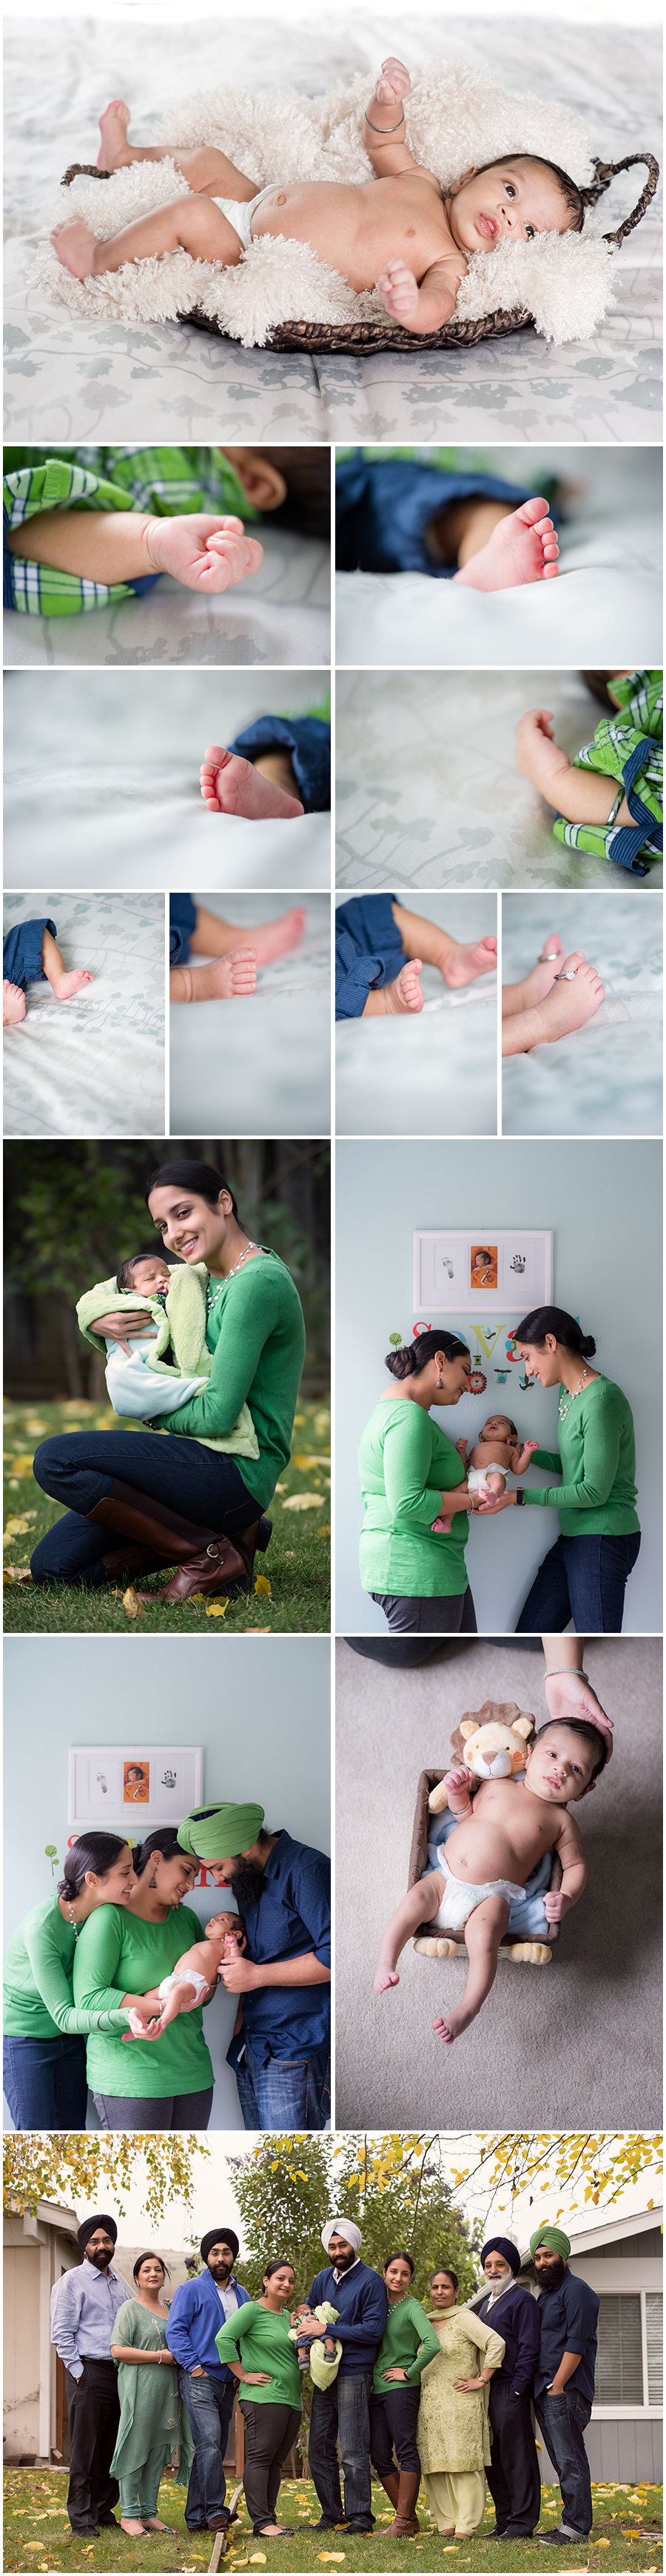 Bay area Newborn baby photographer